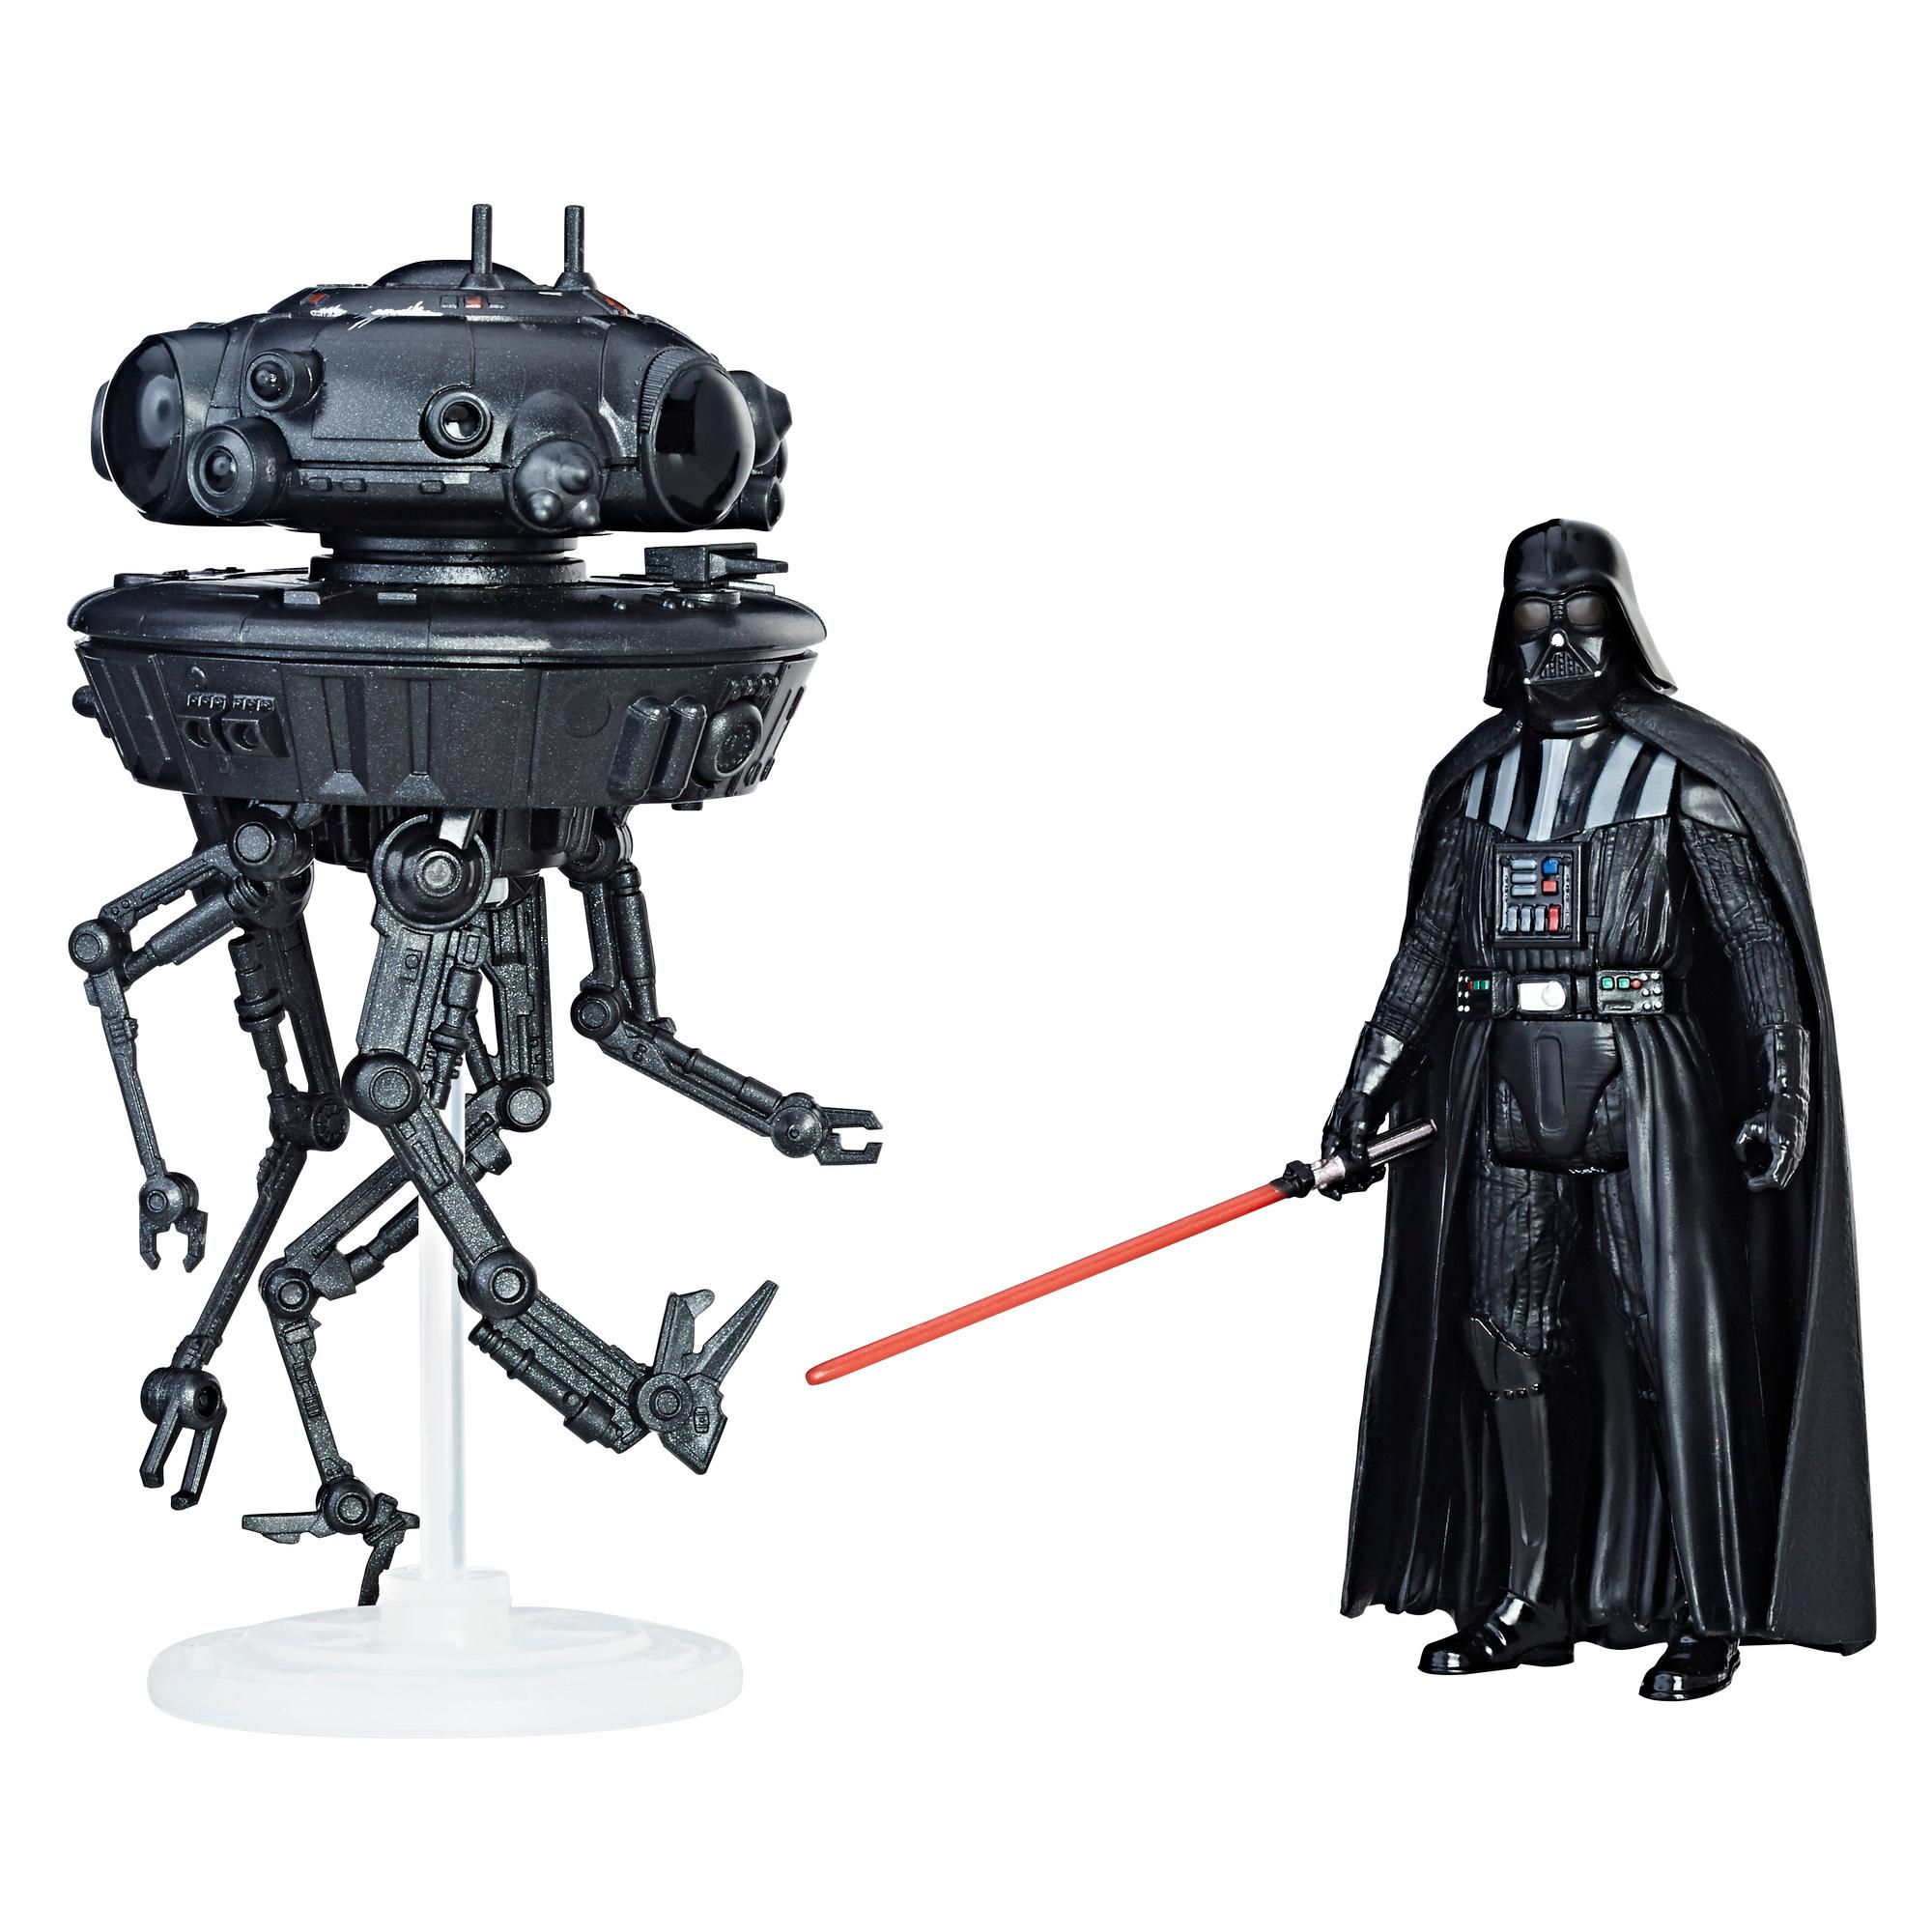 STAR-WARS EPIZÓD 8 Birodalmi Szonda Droid & Darth Vader Figura 2-es CSOMAG